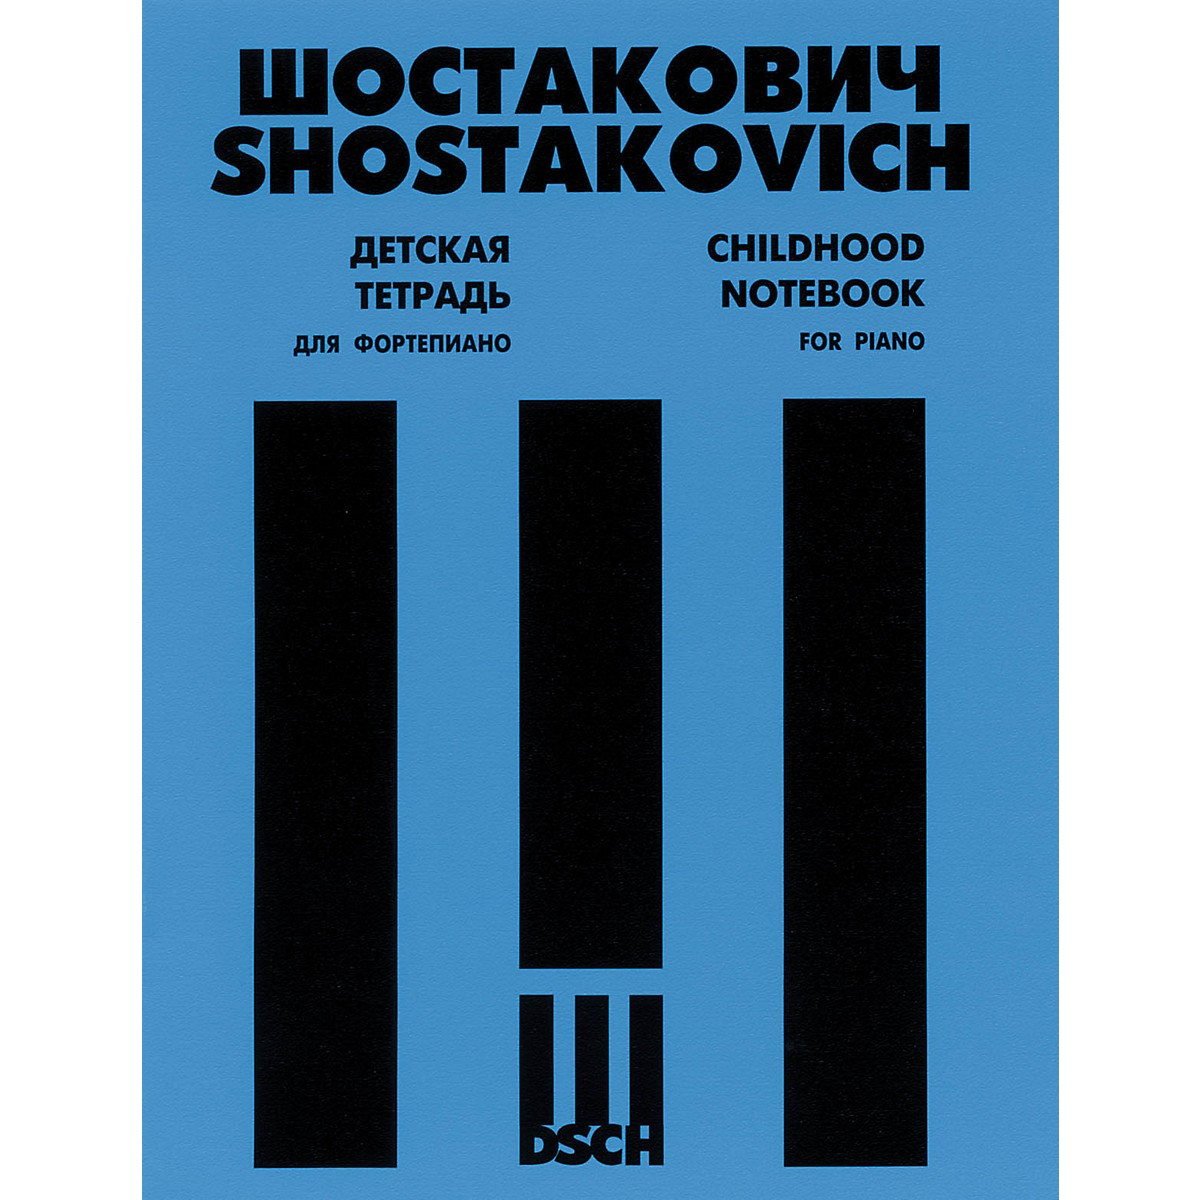 DSCH Childhood Notebook DSCH Series Composed by Dmitri Shostakovich Edited by Manashir Iakubov